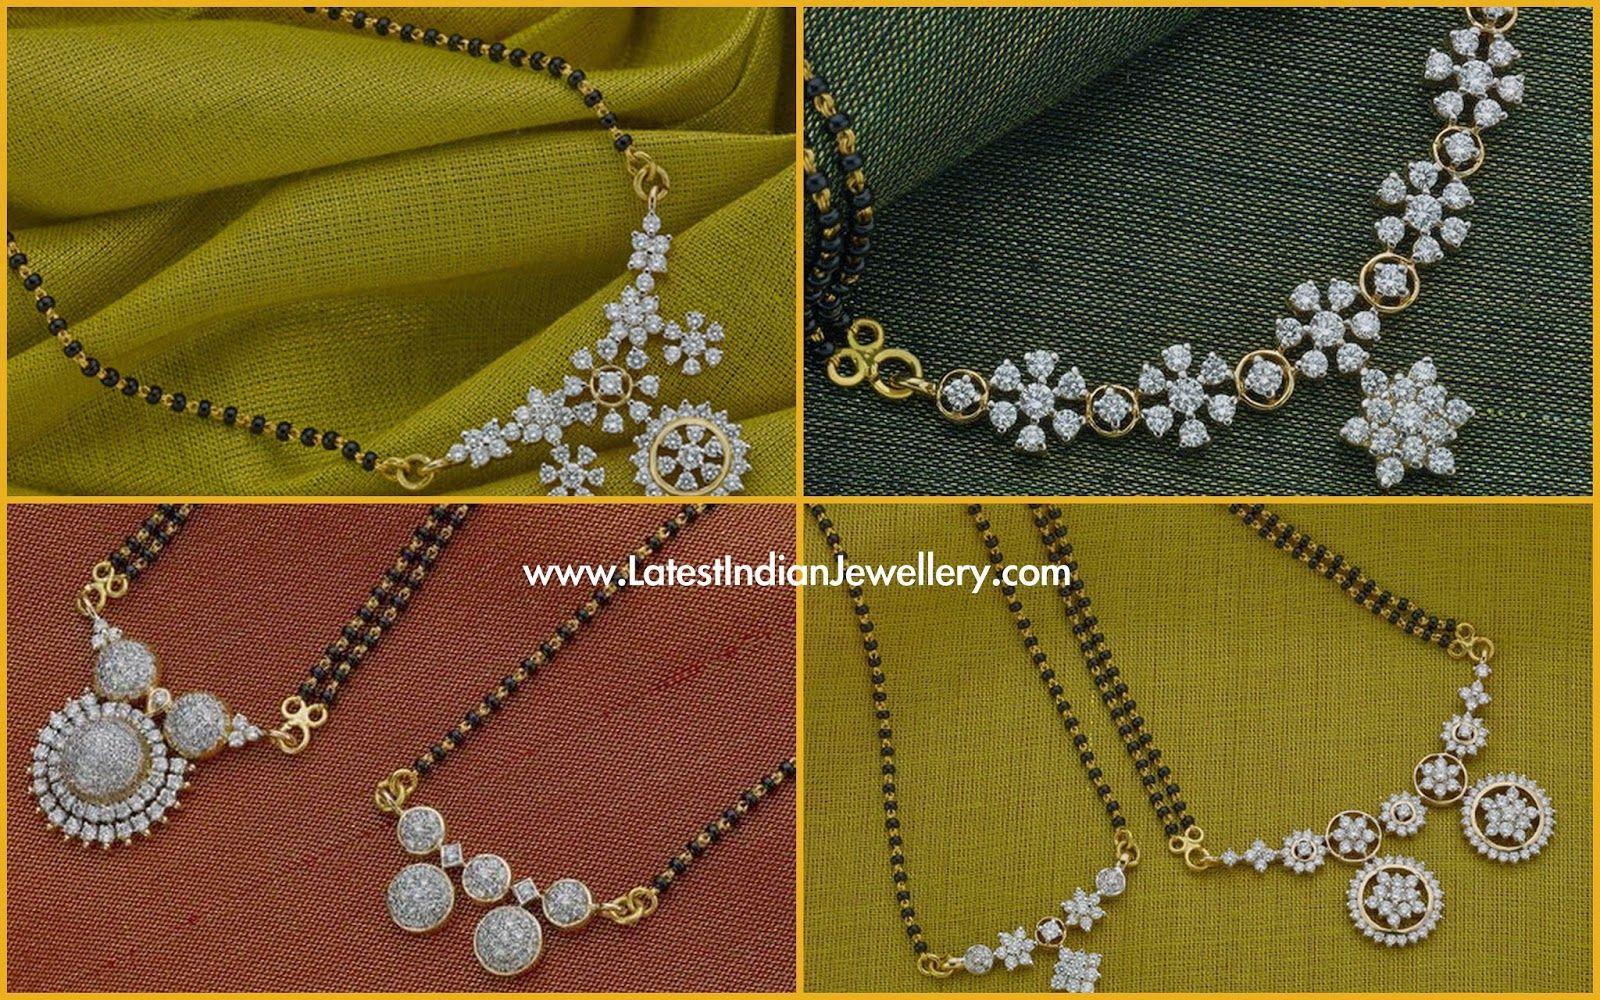 Diamond Pendant Black Beads Mangalsutra Designs   Latest Indian Jewellery Designs